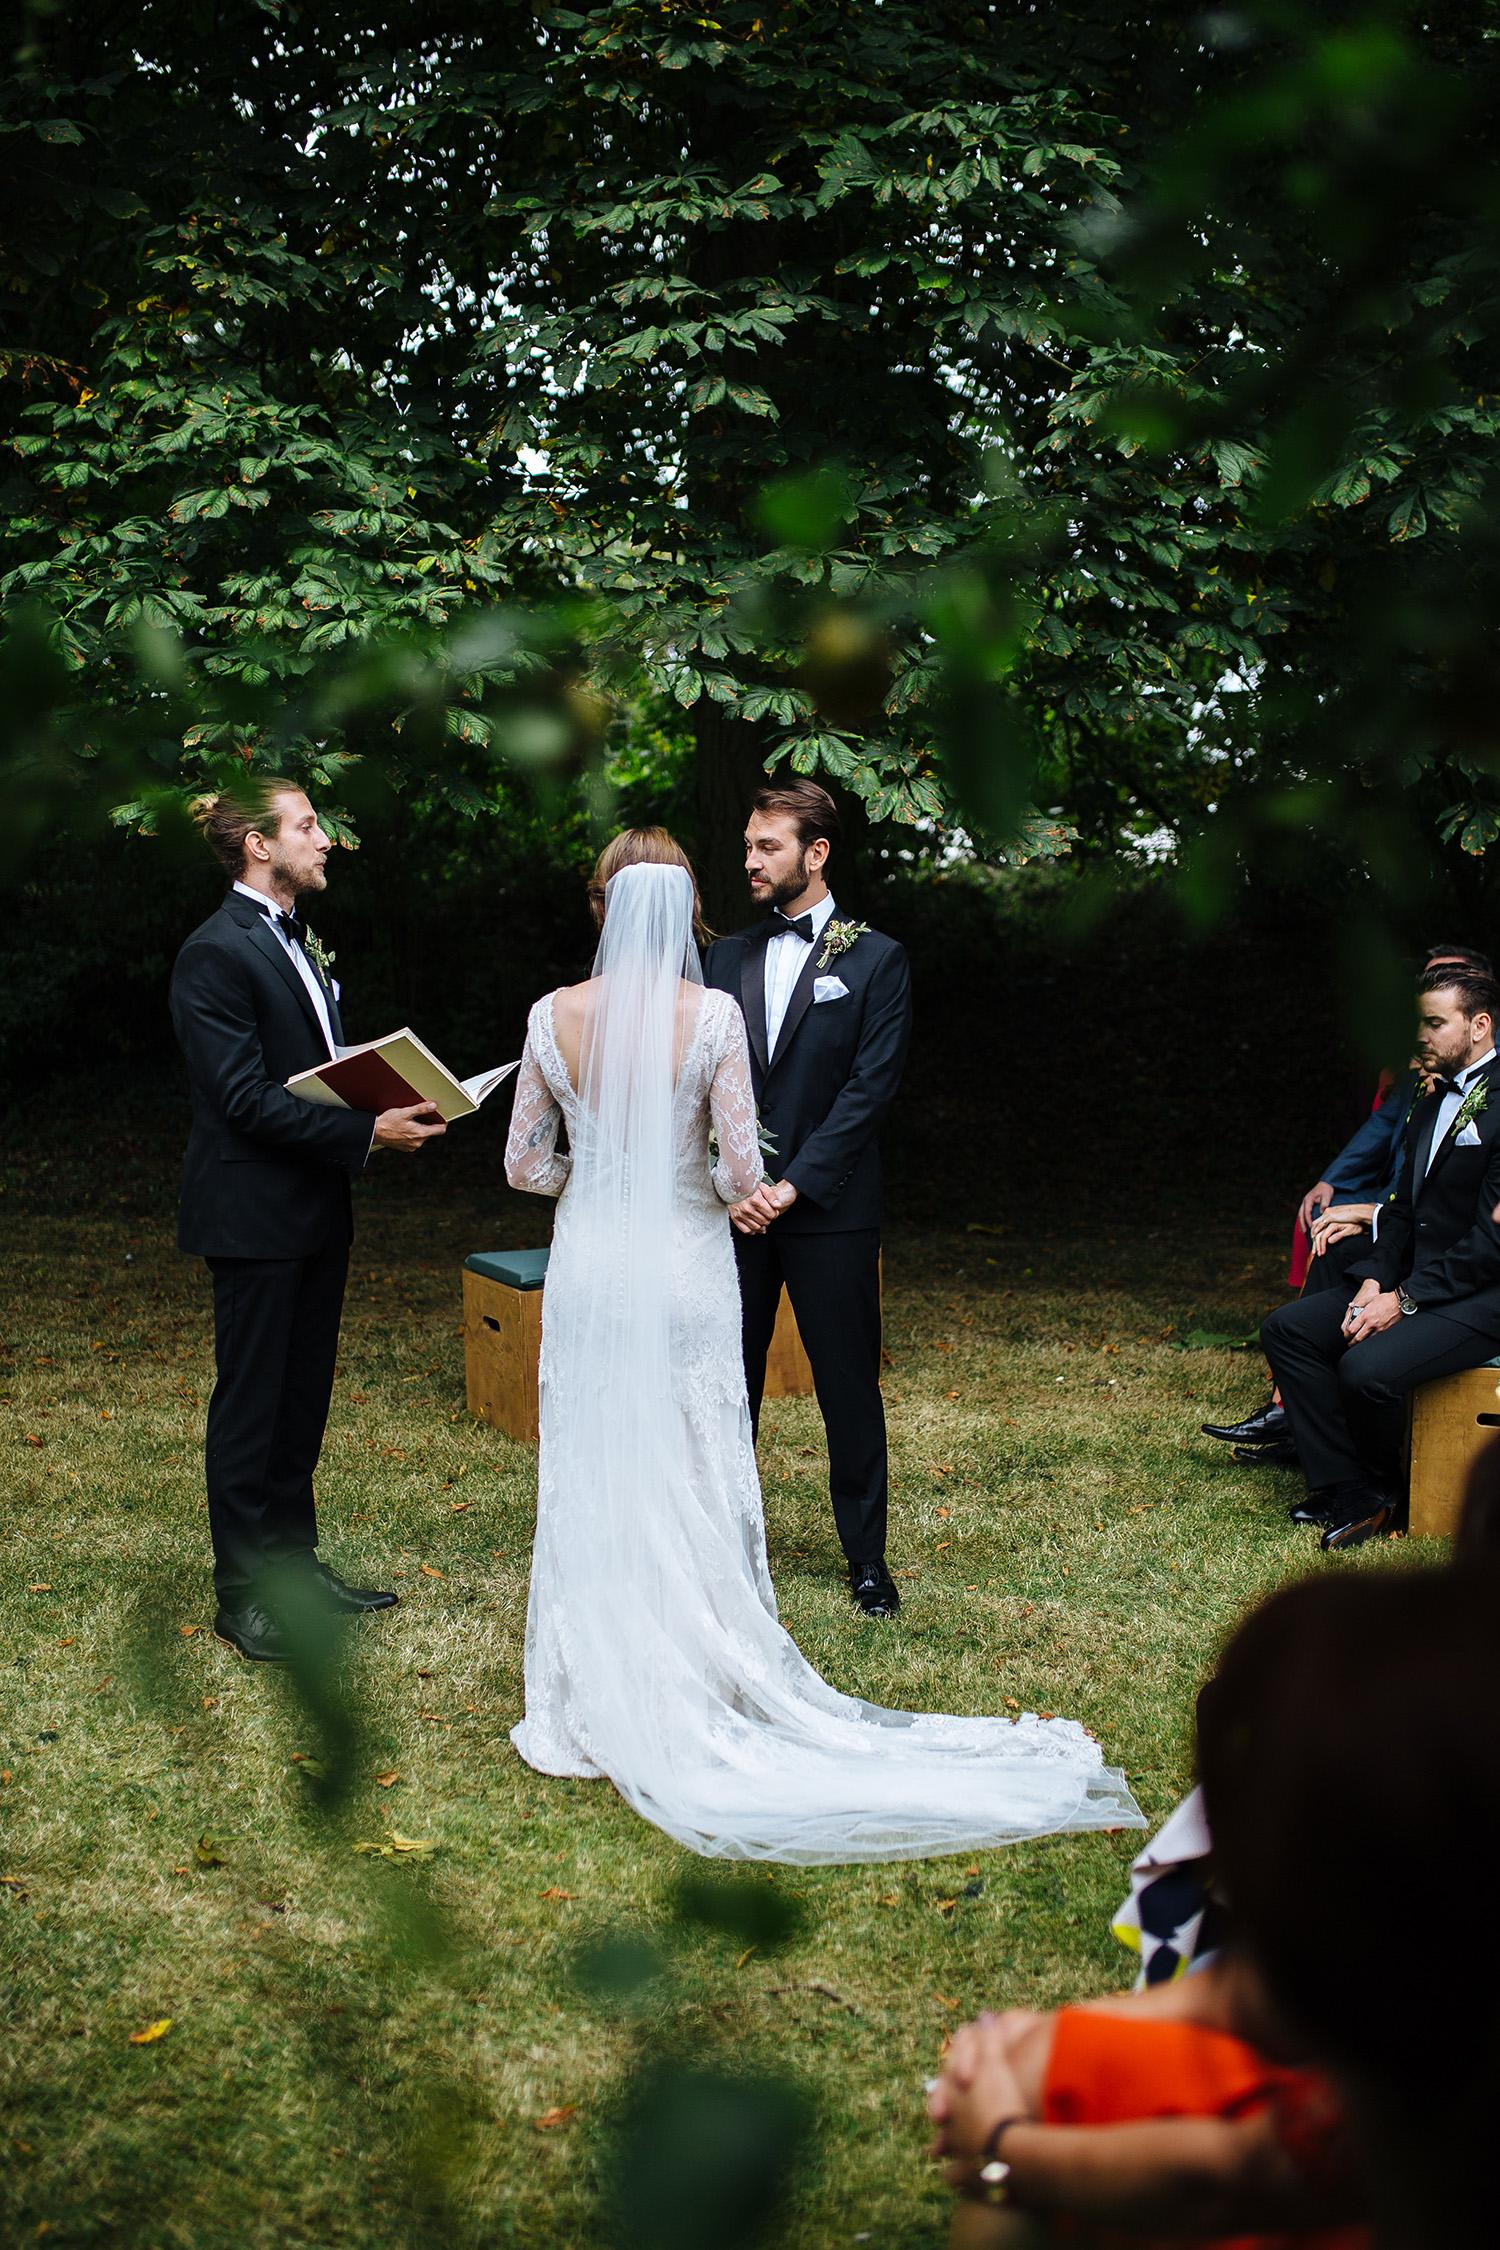 CHILDERLEY HALL CAMBRIDGE WEDDING 33.JPG